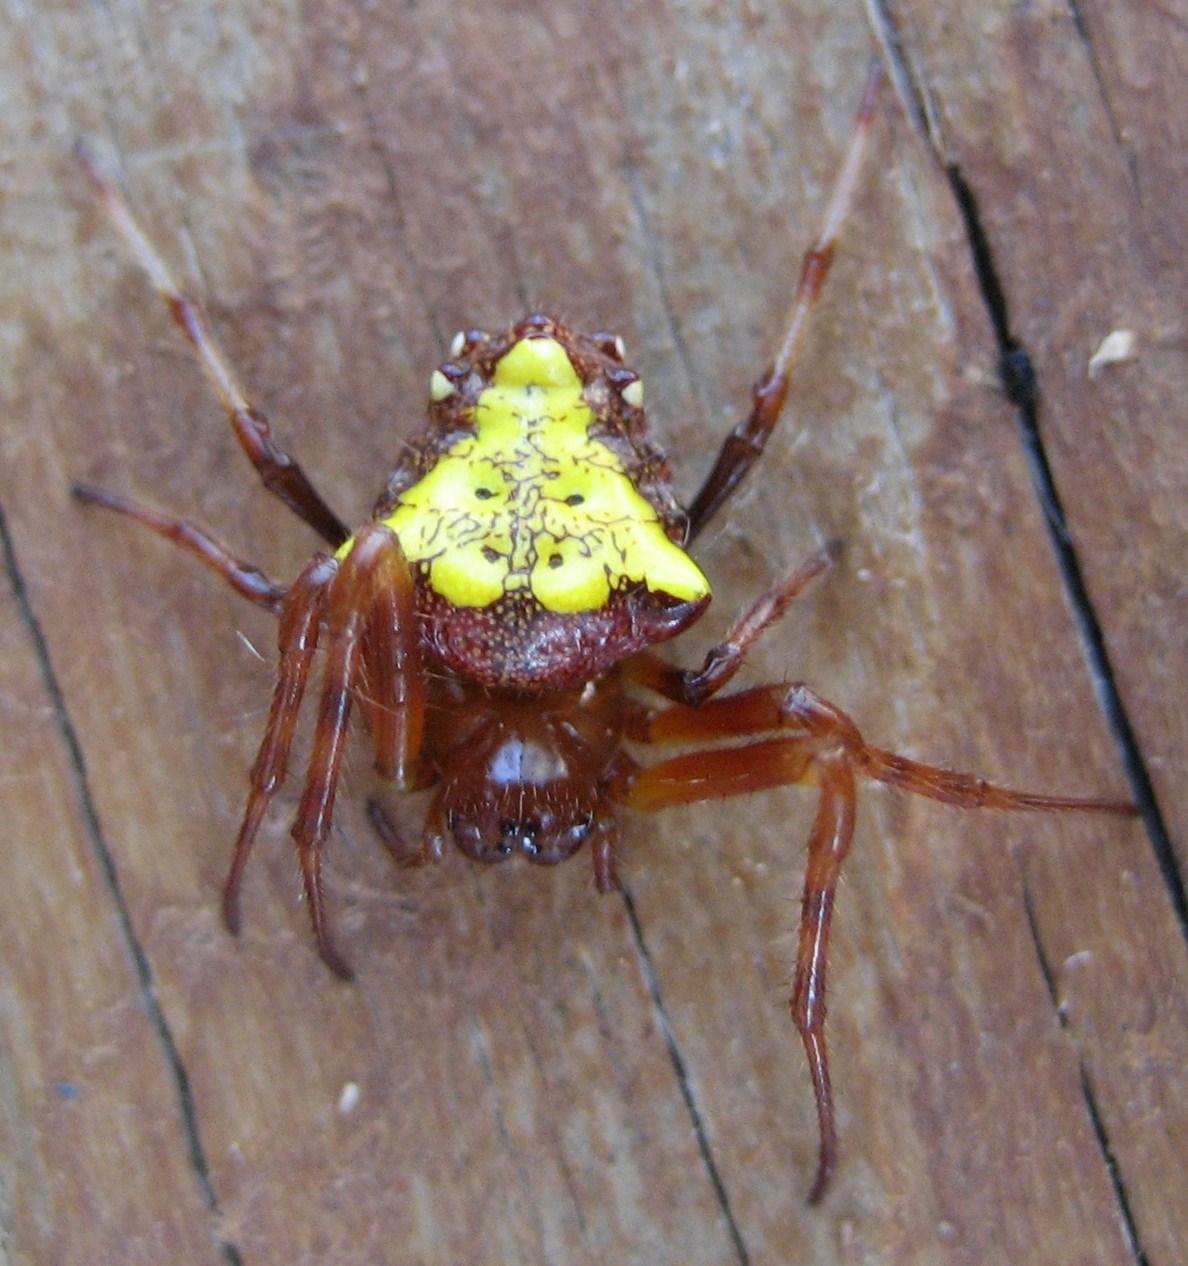 Arrowhead Spider (Verrucosa arenata)